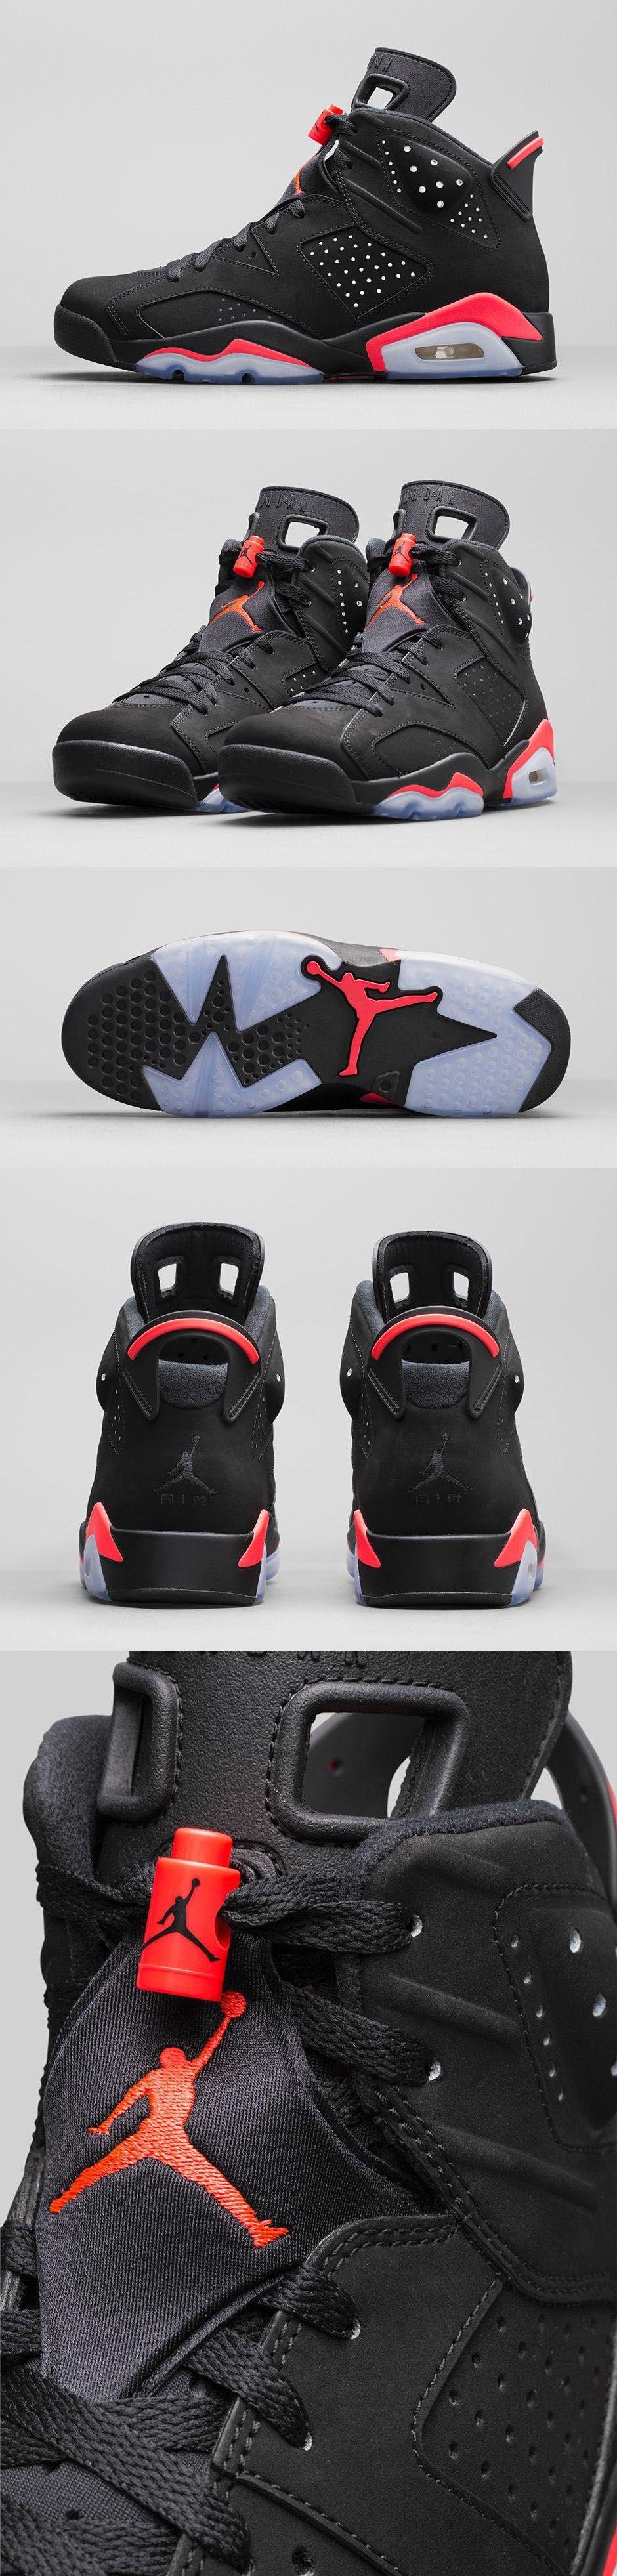 Air Jordan XIII (13) Retro Femme-37